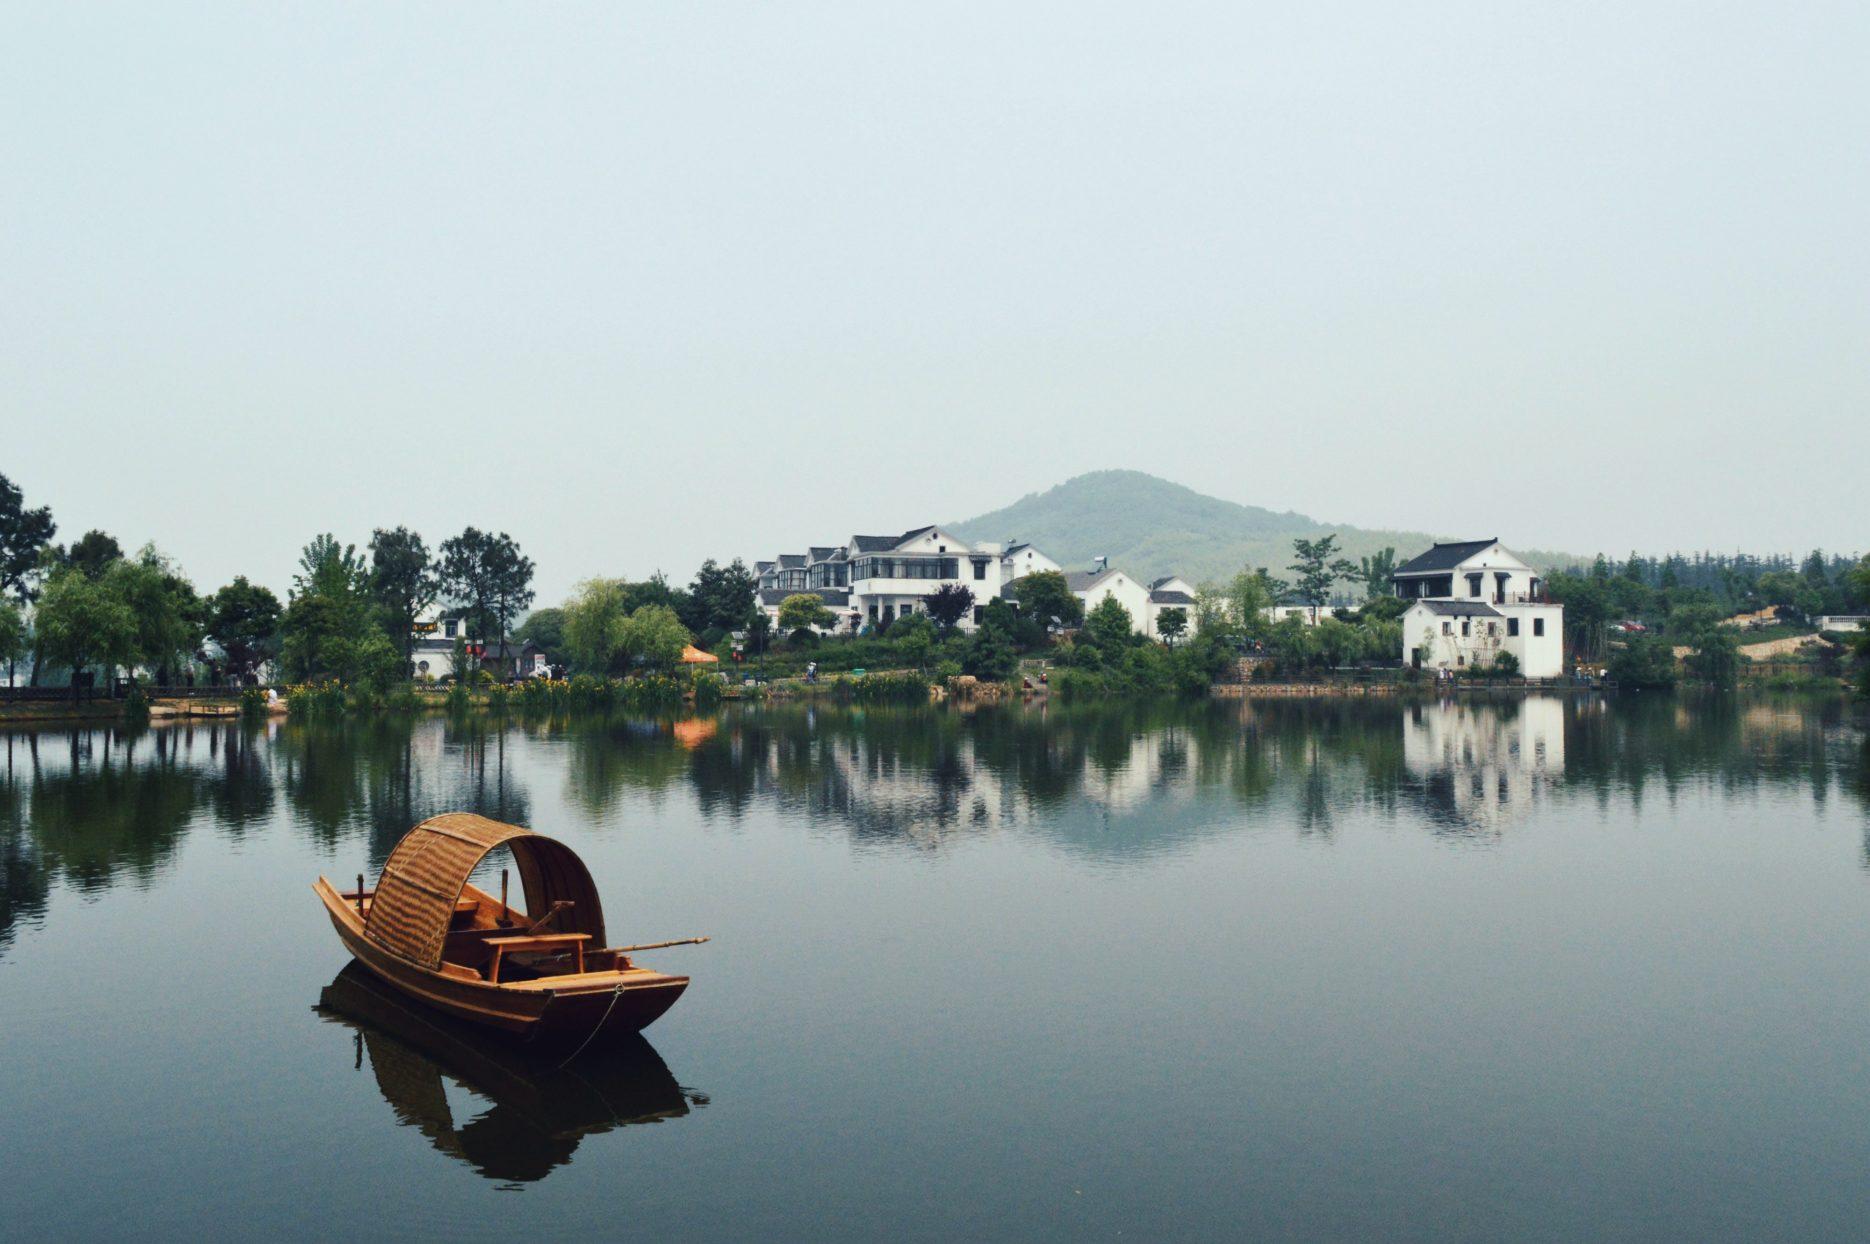 Nanjing scenery. Credit: Unsplash